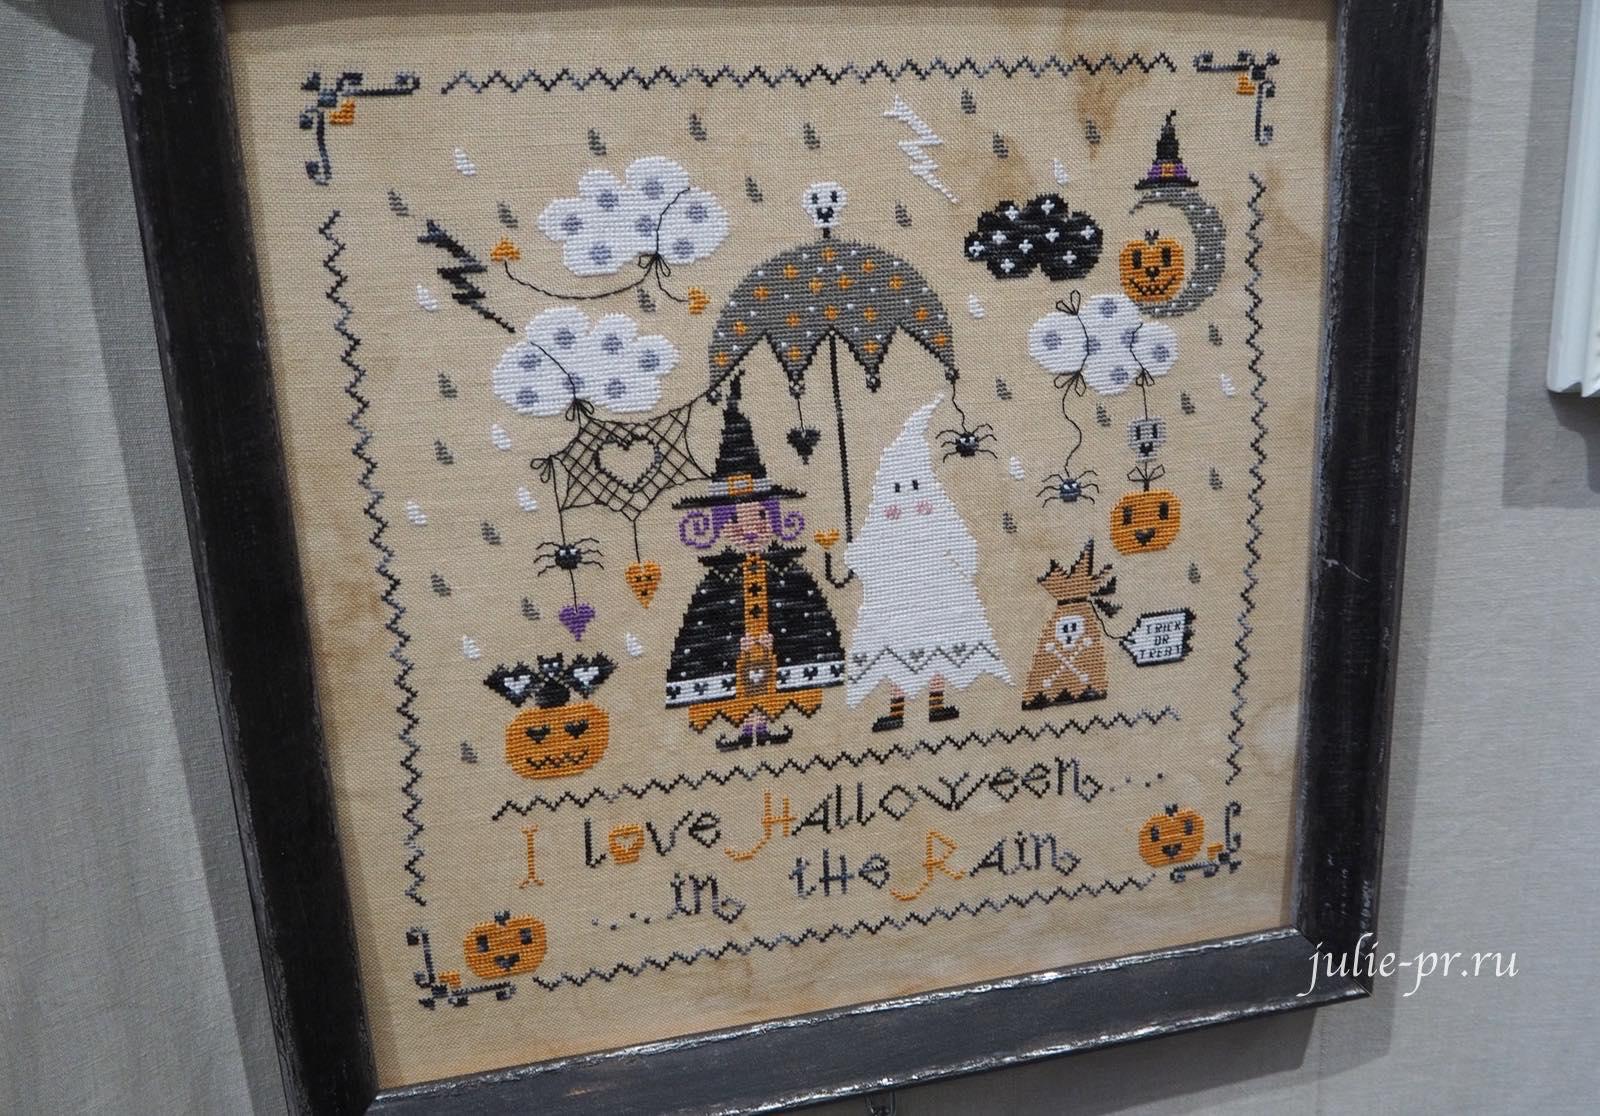 Cuore e Batticuore, Halloween in the Rain, хеллоуин под дождем, вышивка крестом